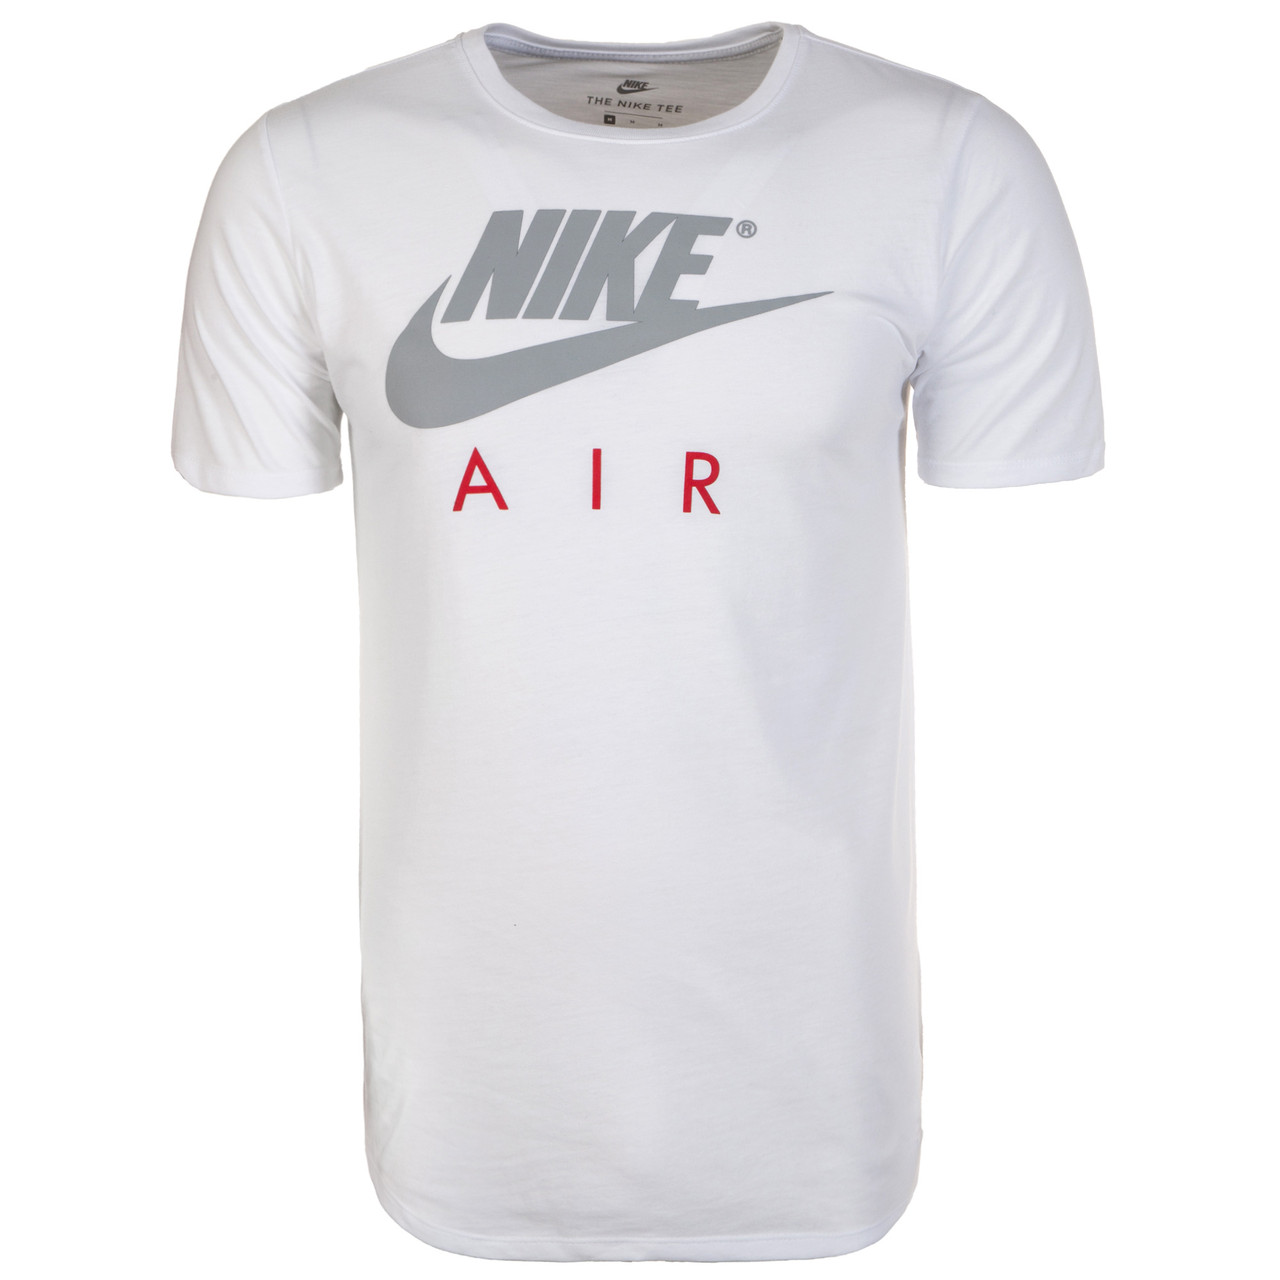 63e029d8 Купить Мужская футболка NIKE NSW TEE AIR HD LOGO (Артикул: 847511 ...